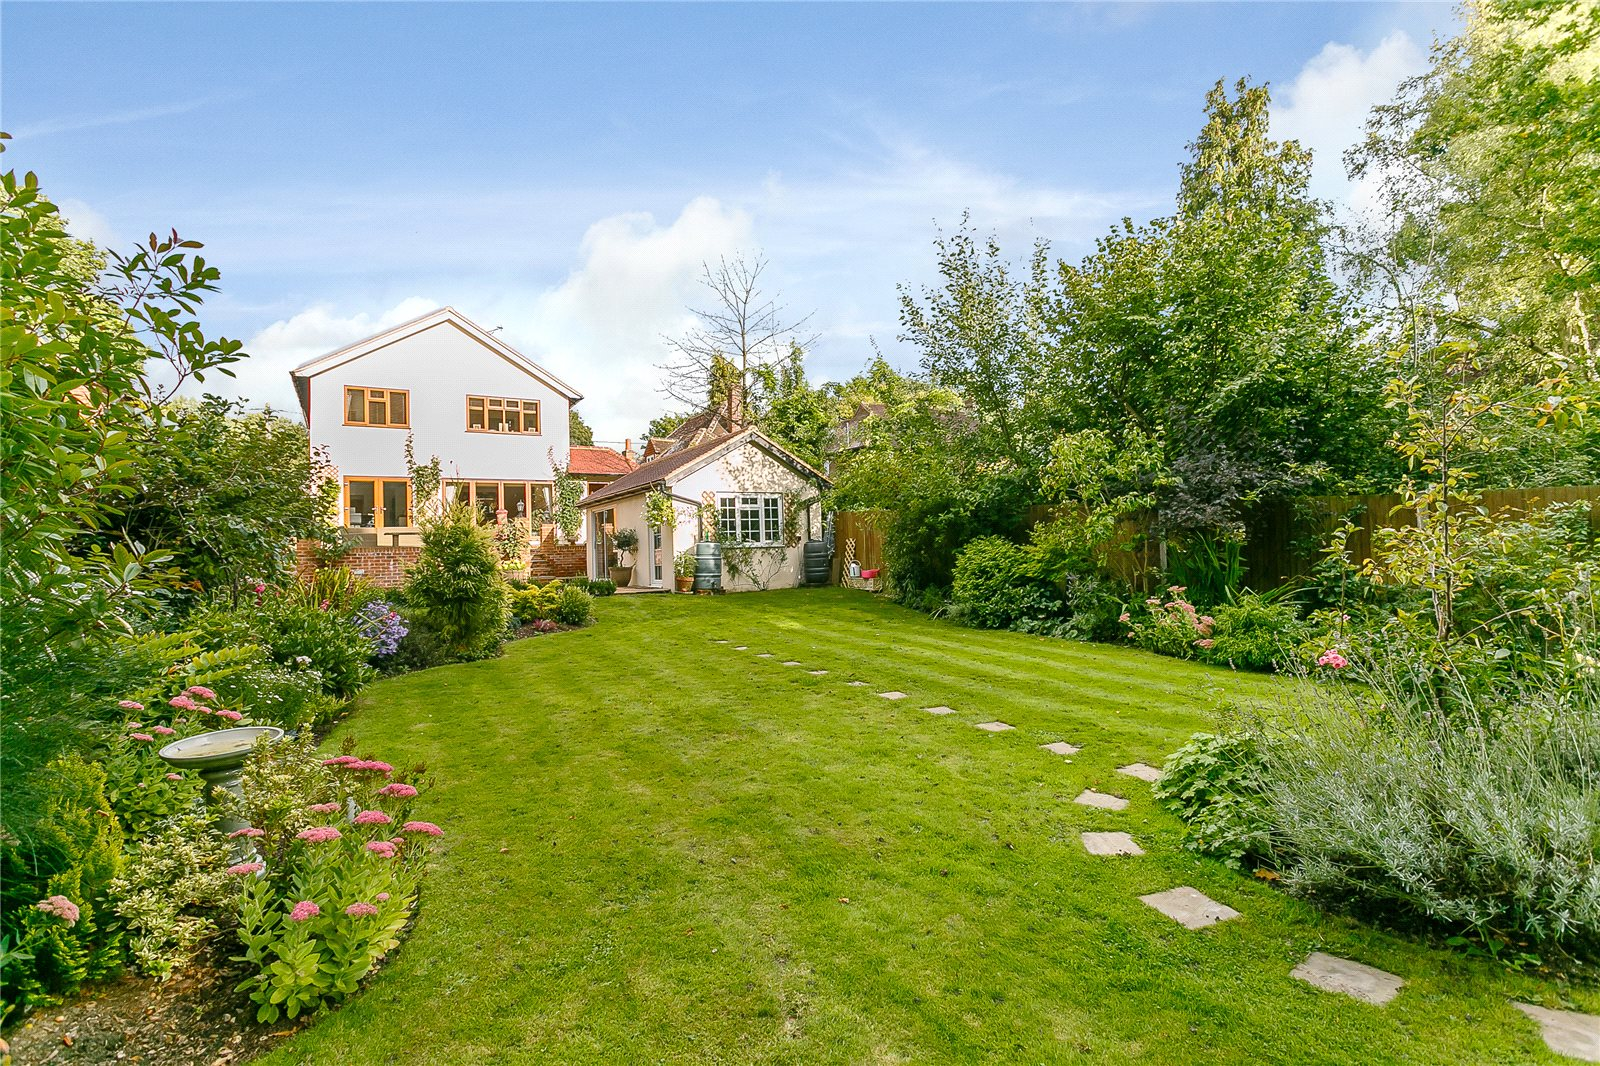 独户住宅 为 销售 在 Glaziers Lane, Normandy, Guildford, Surrey, GU3 Guildford, 英格兰